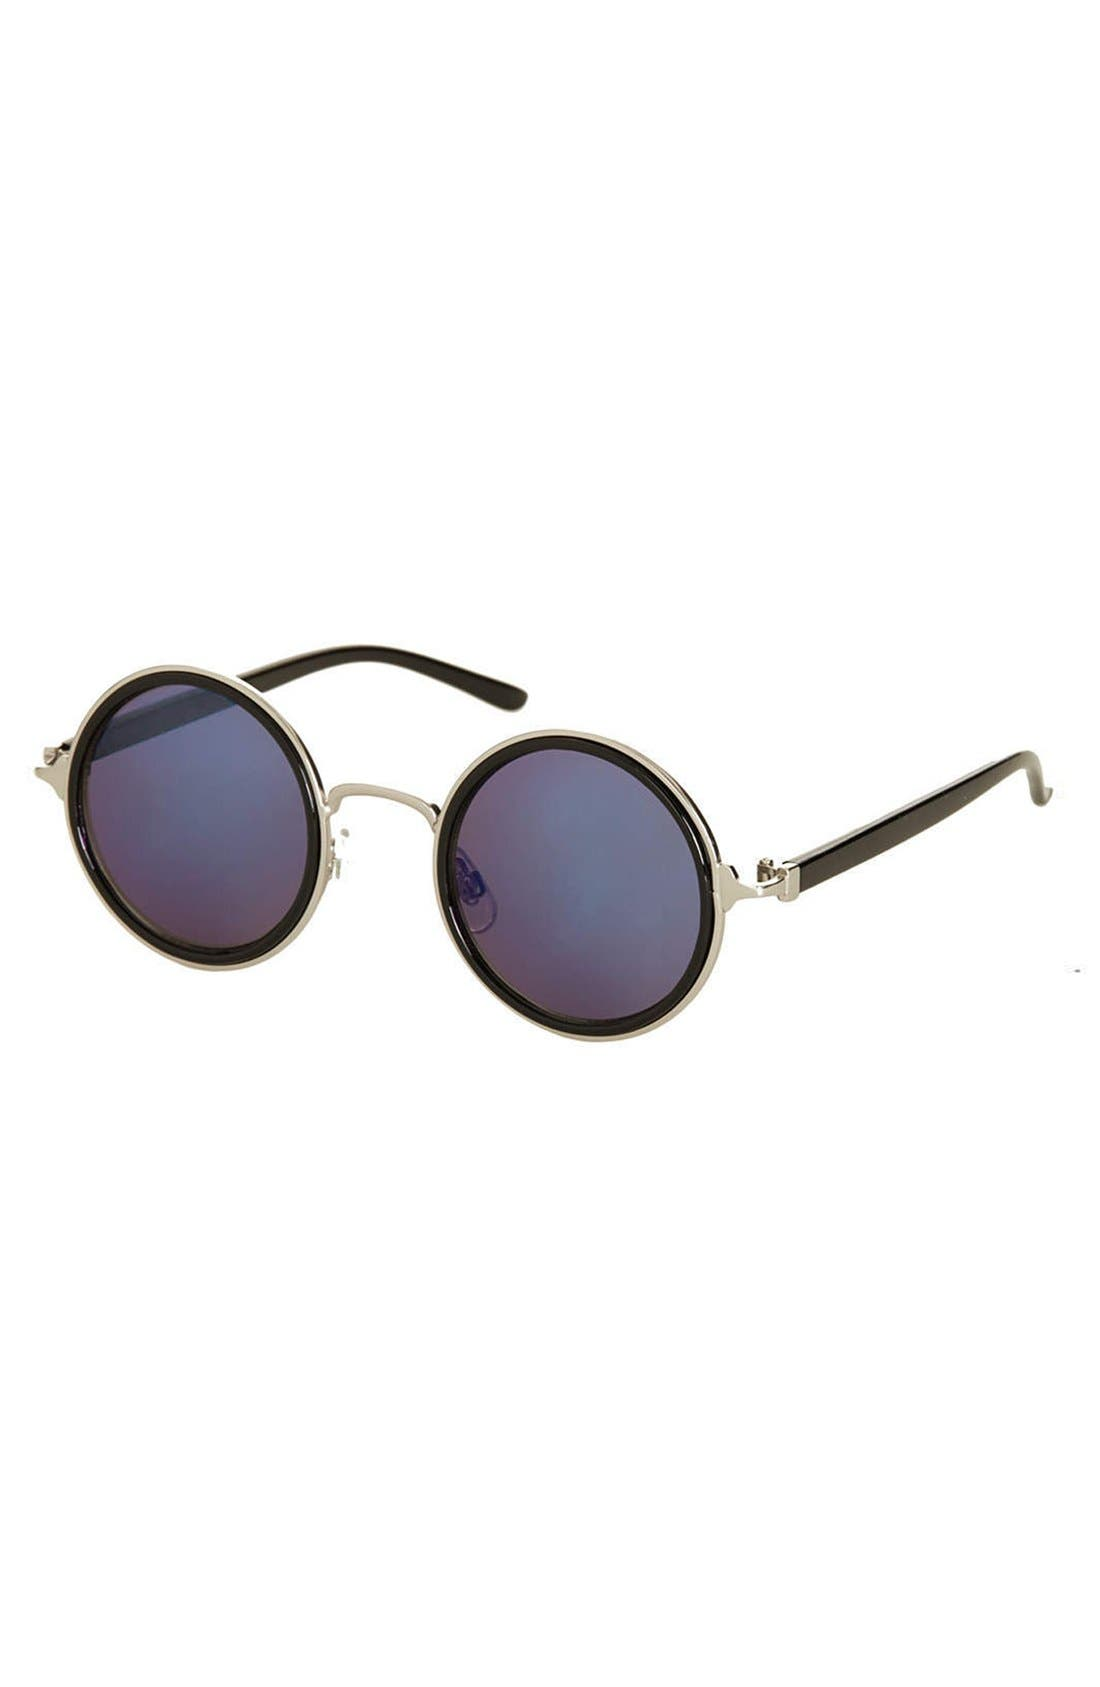 Main Image - Topshop 'Mimi Revo' 47mm Round Sunglasses